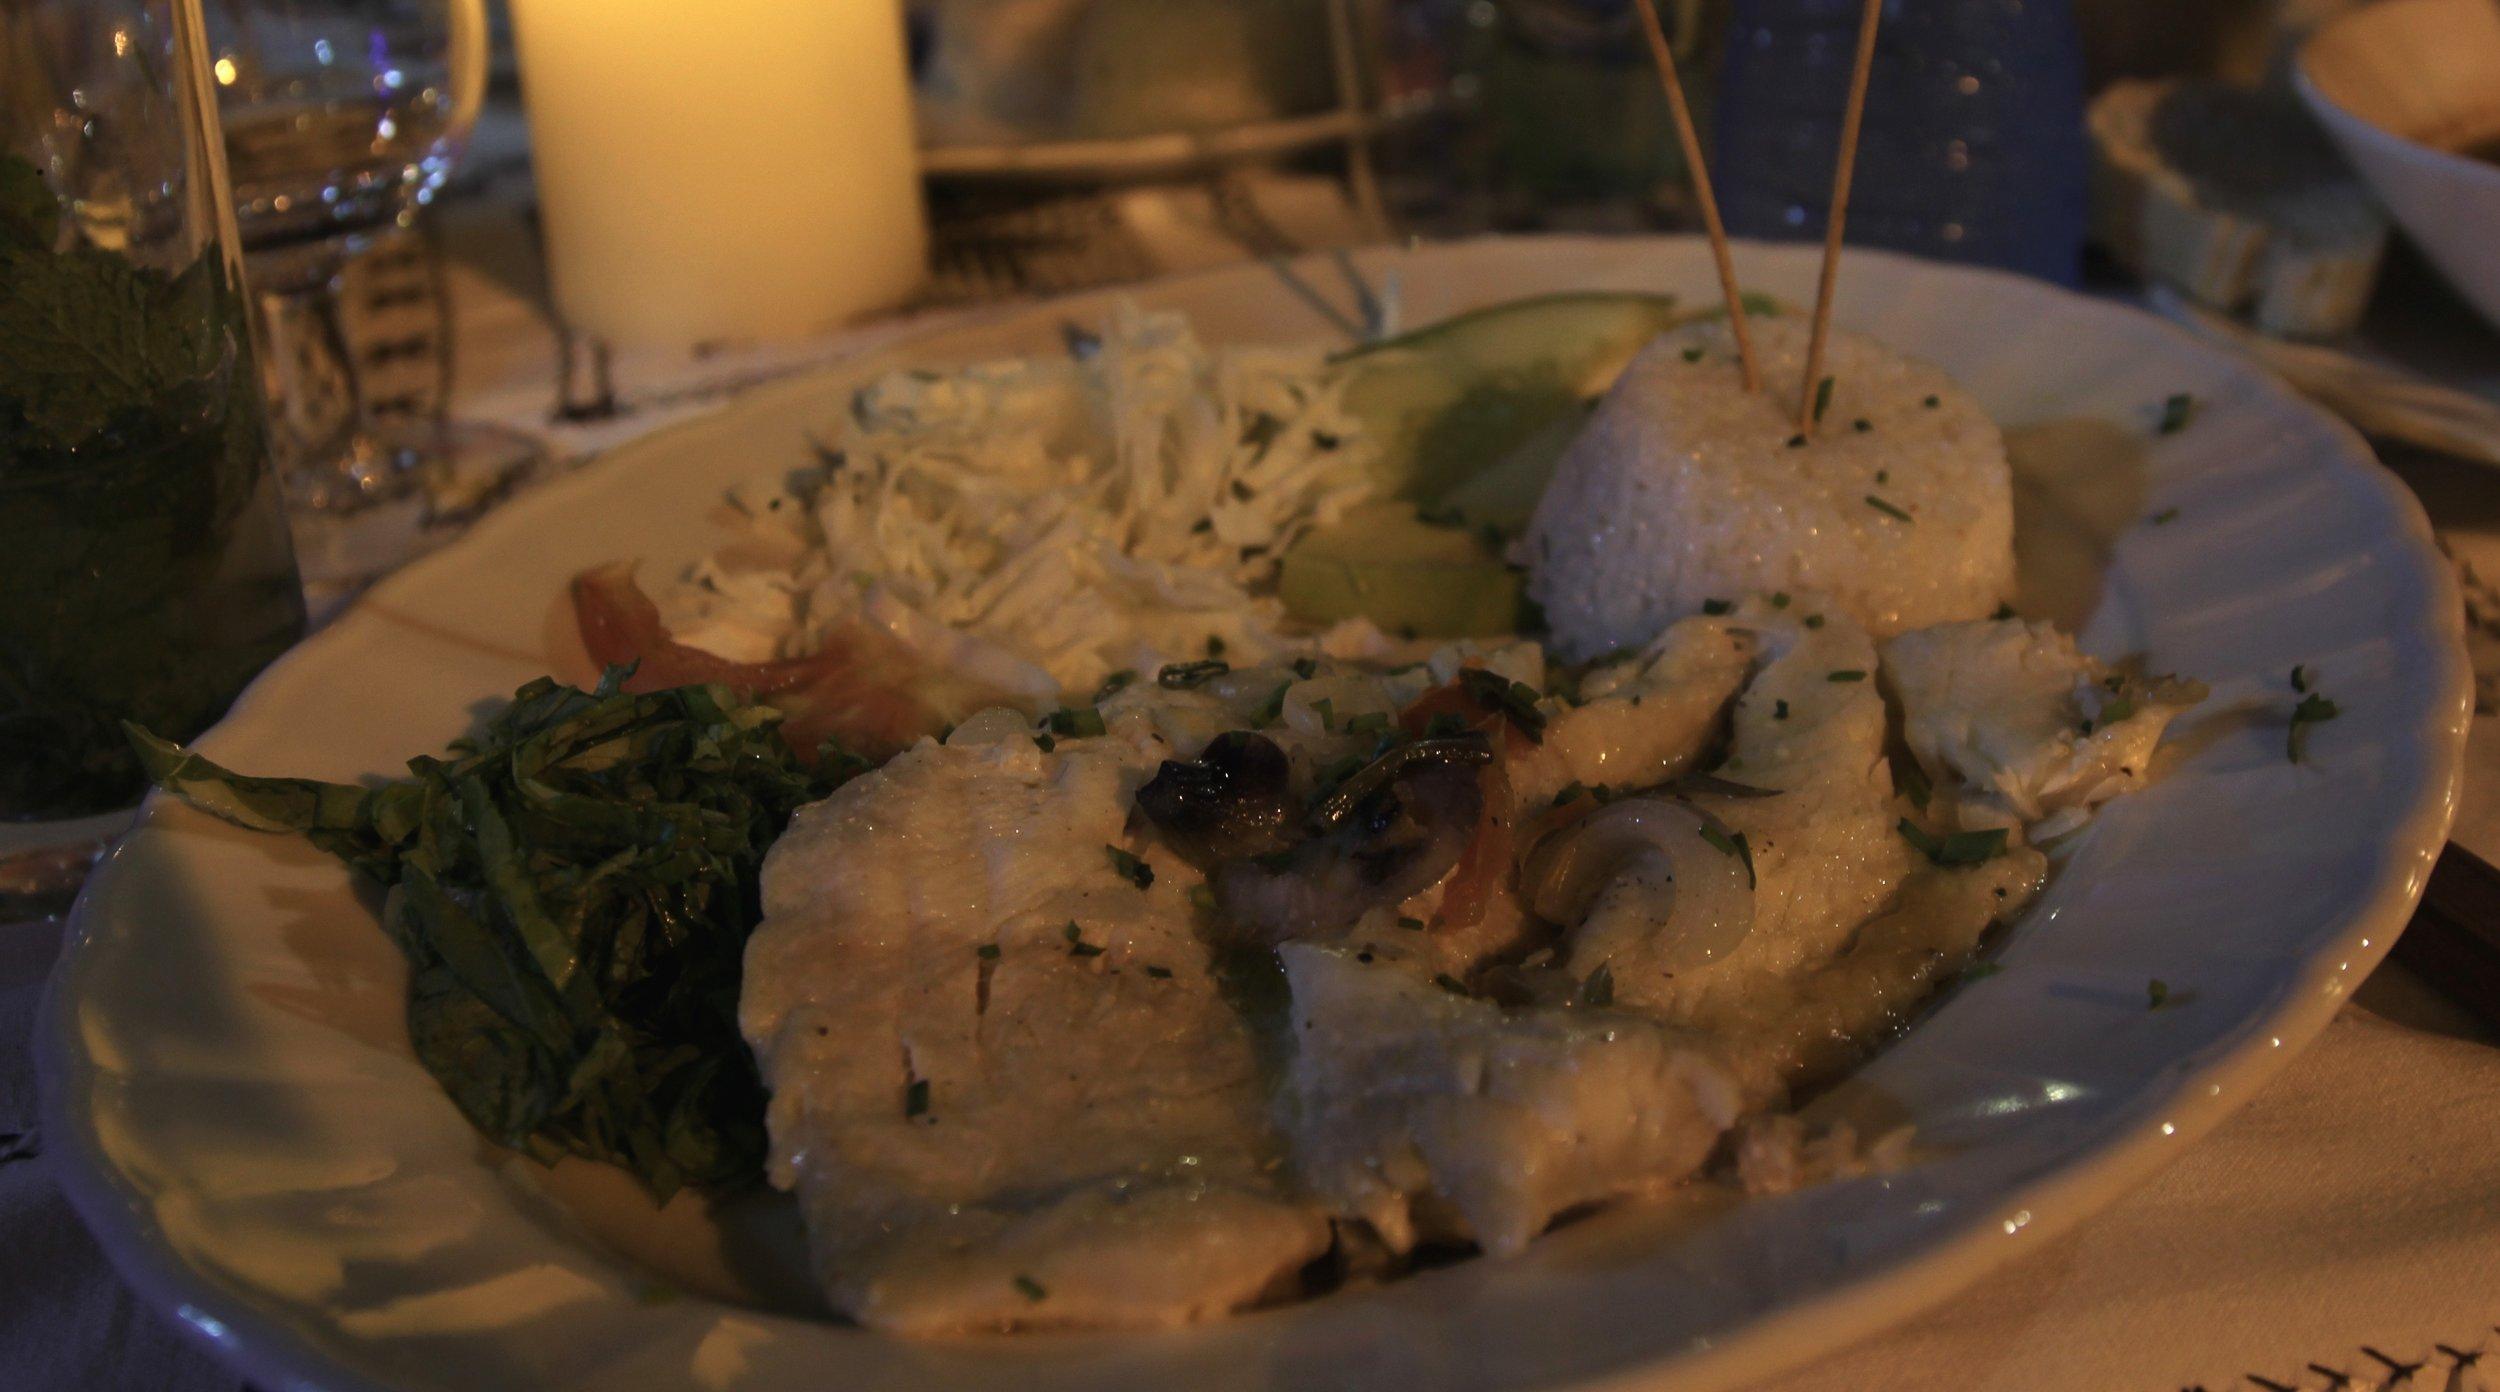 food in Cuba - Fish and rice at Los Conspiradores